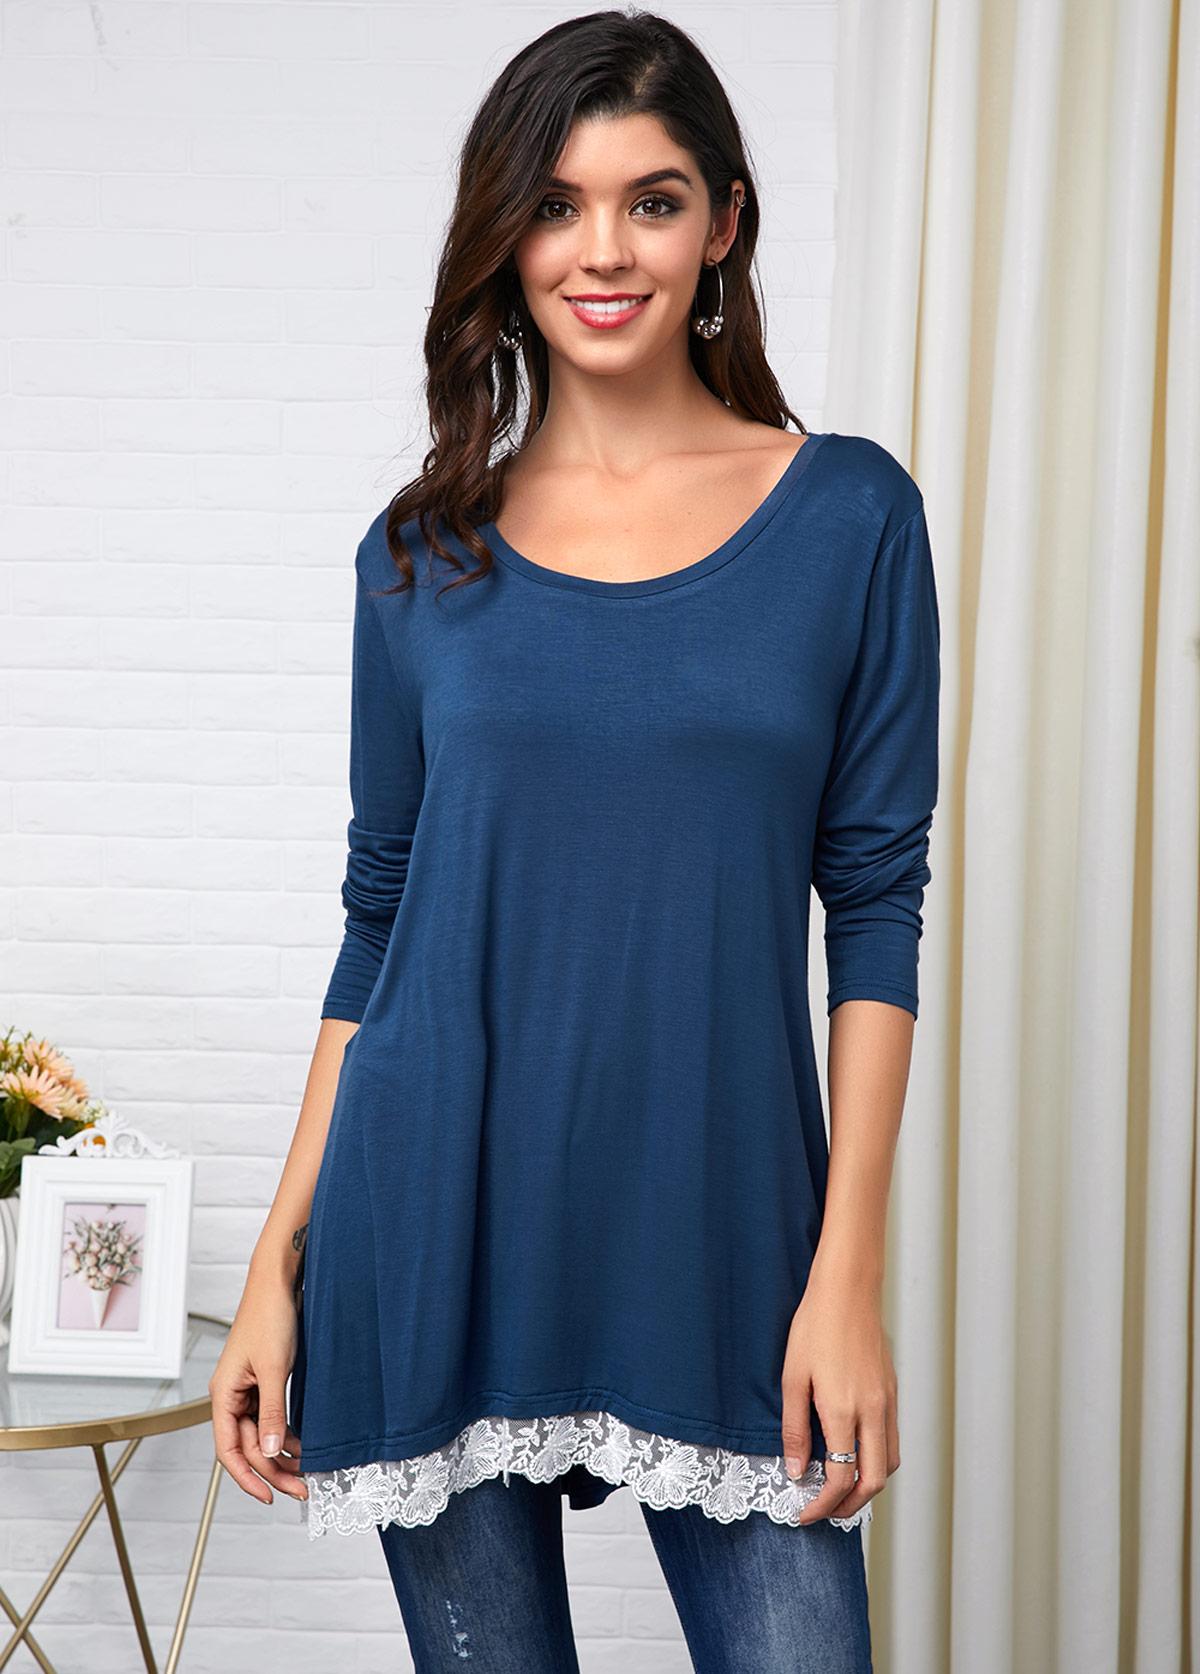 Lace Panel Long Sleeve Peacock Blue T Shirt